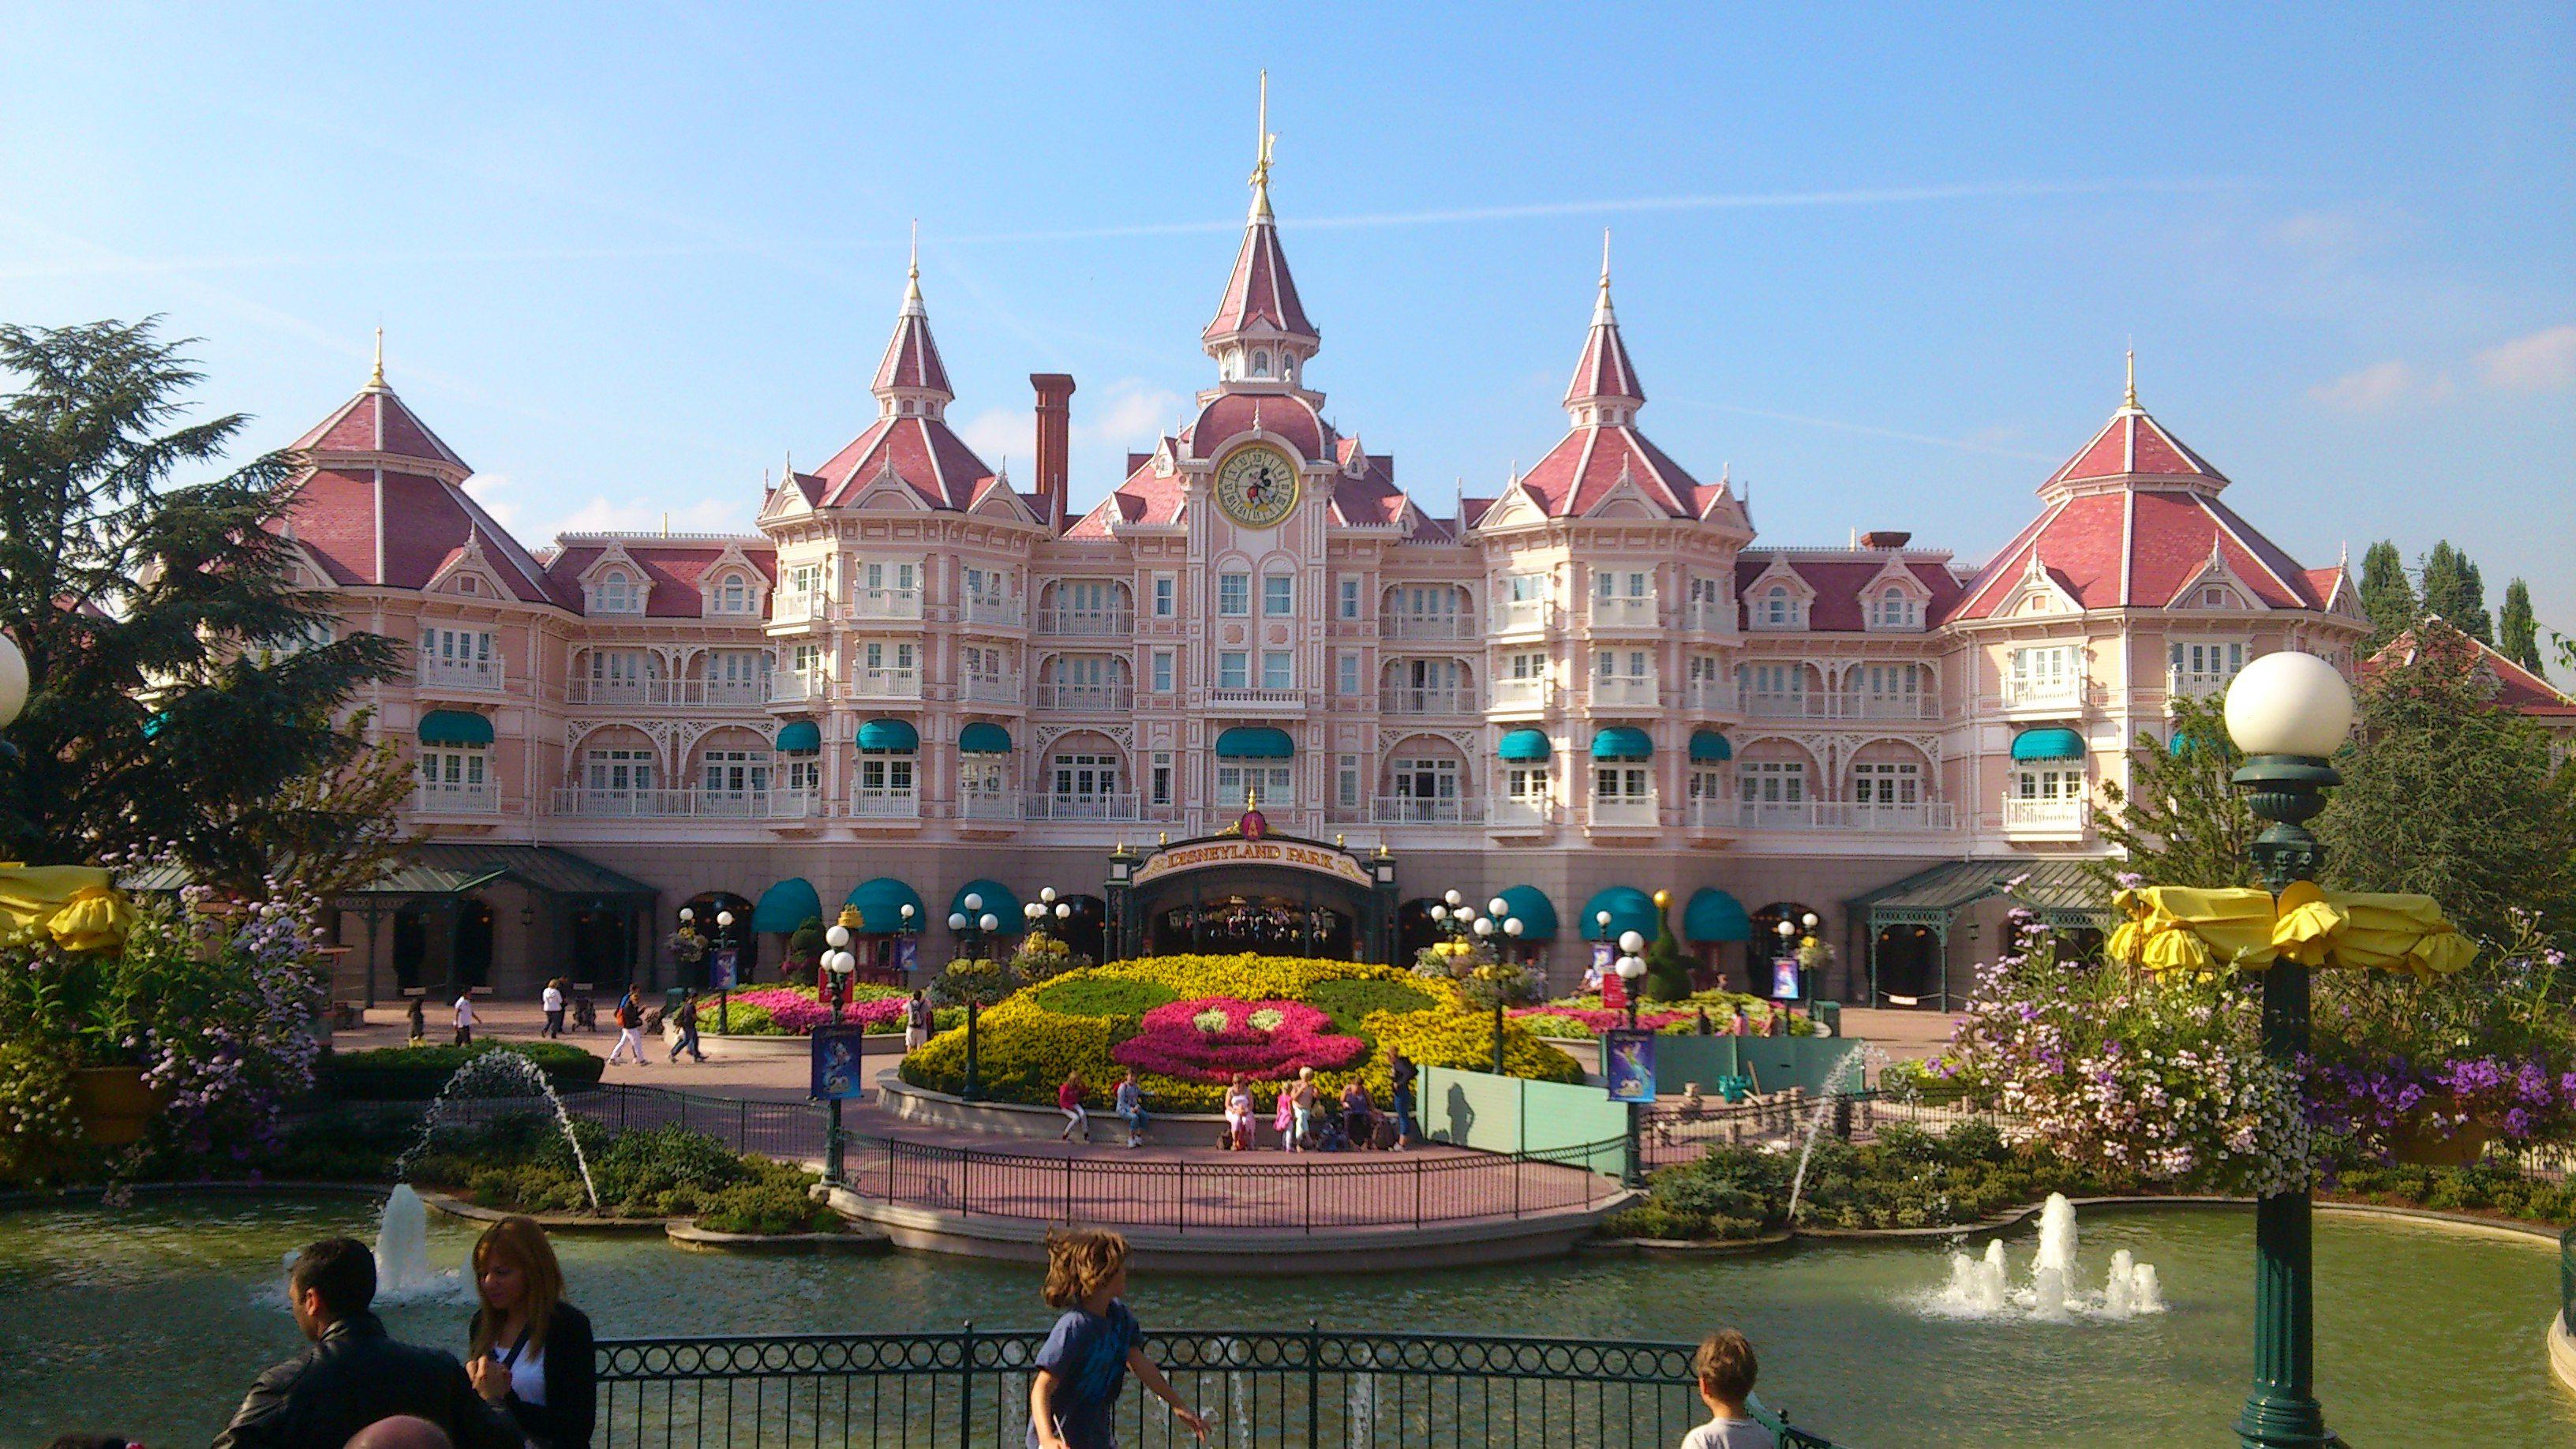 disney land en fleurs devant l'hôtel Disneyland